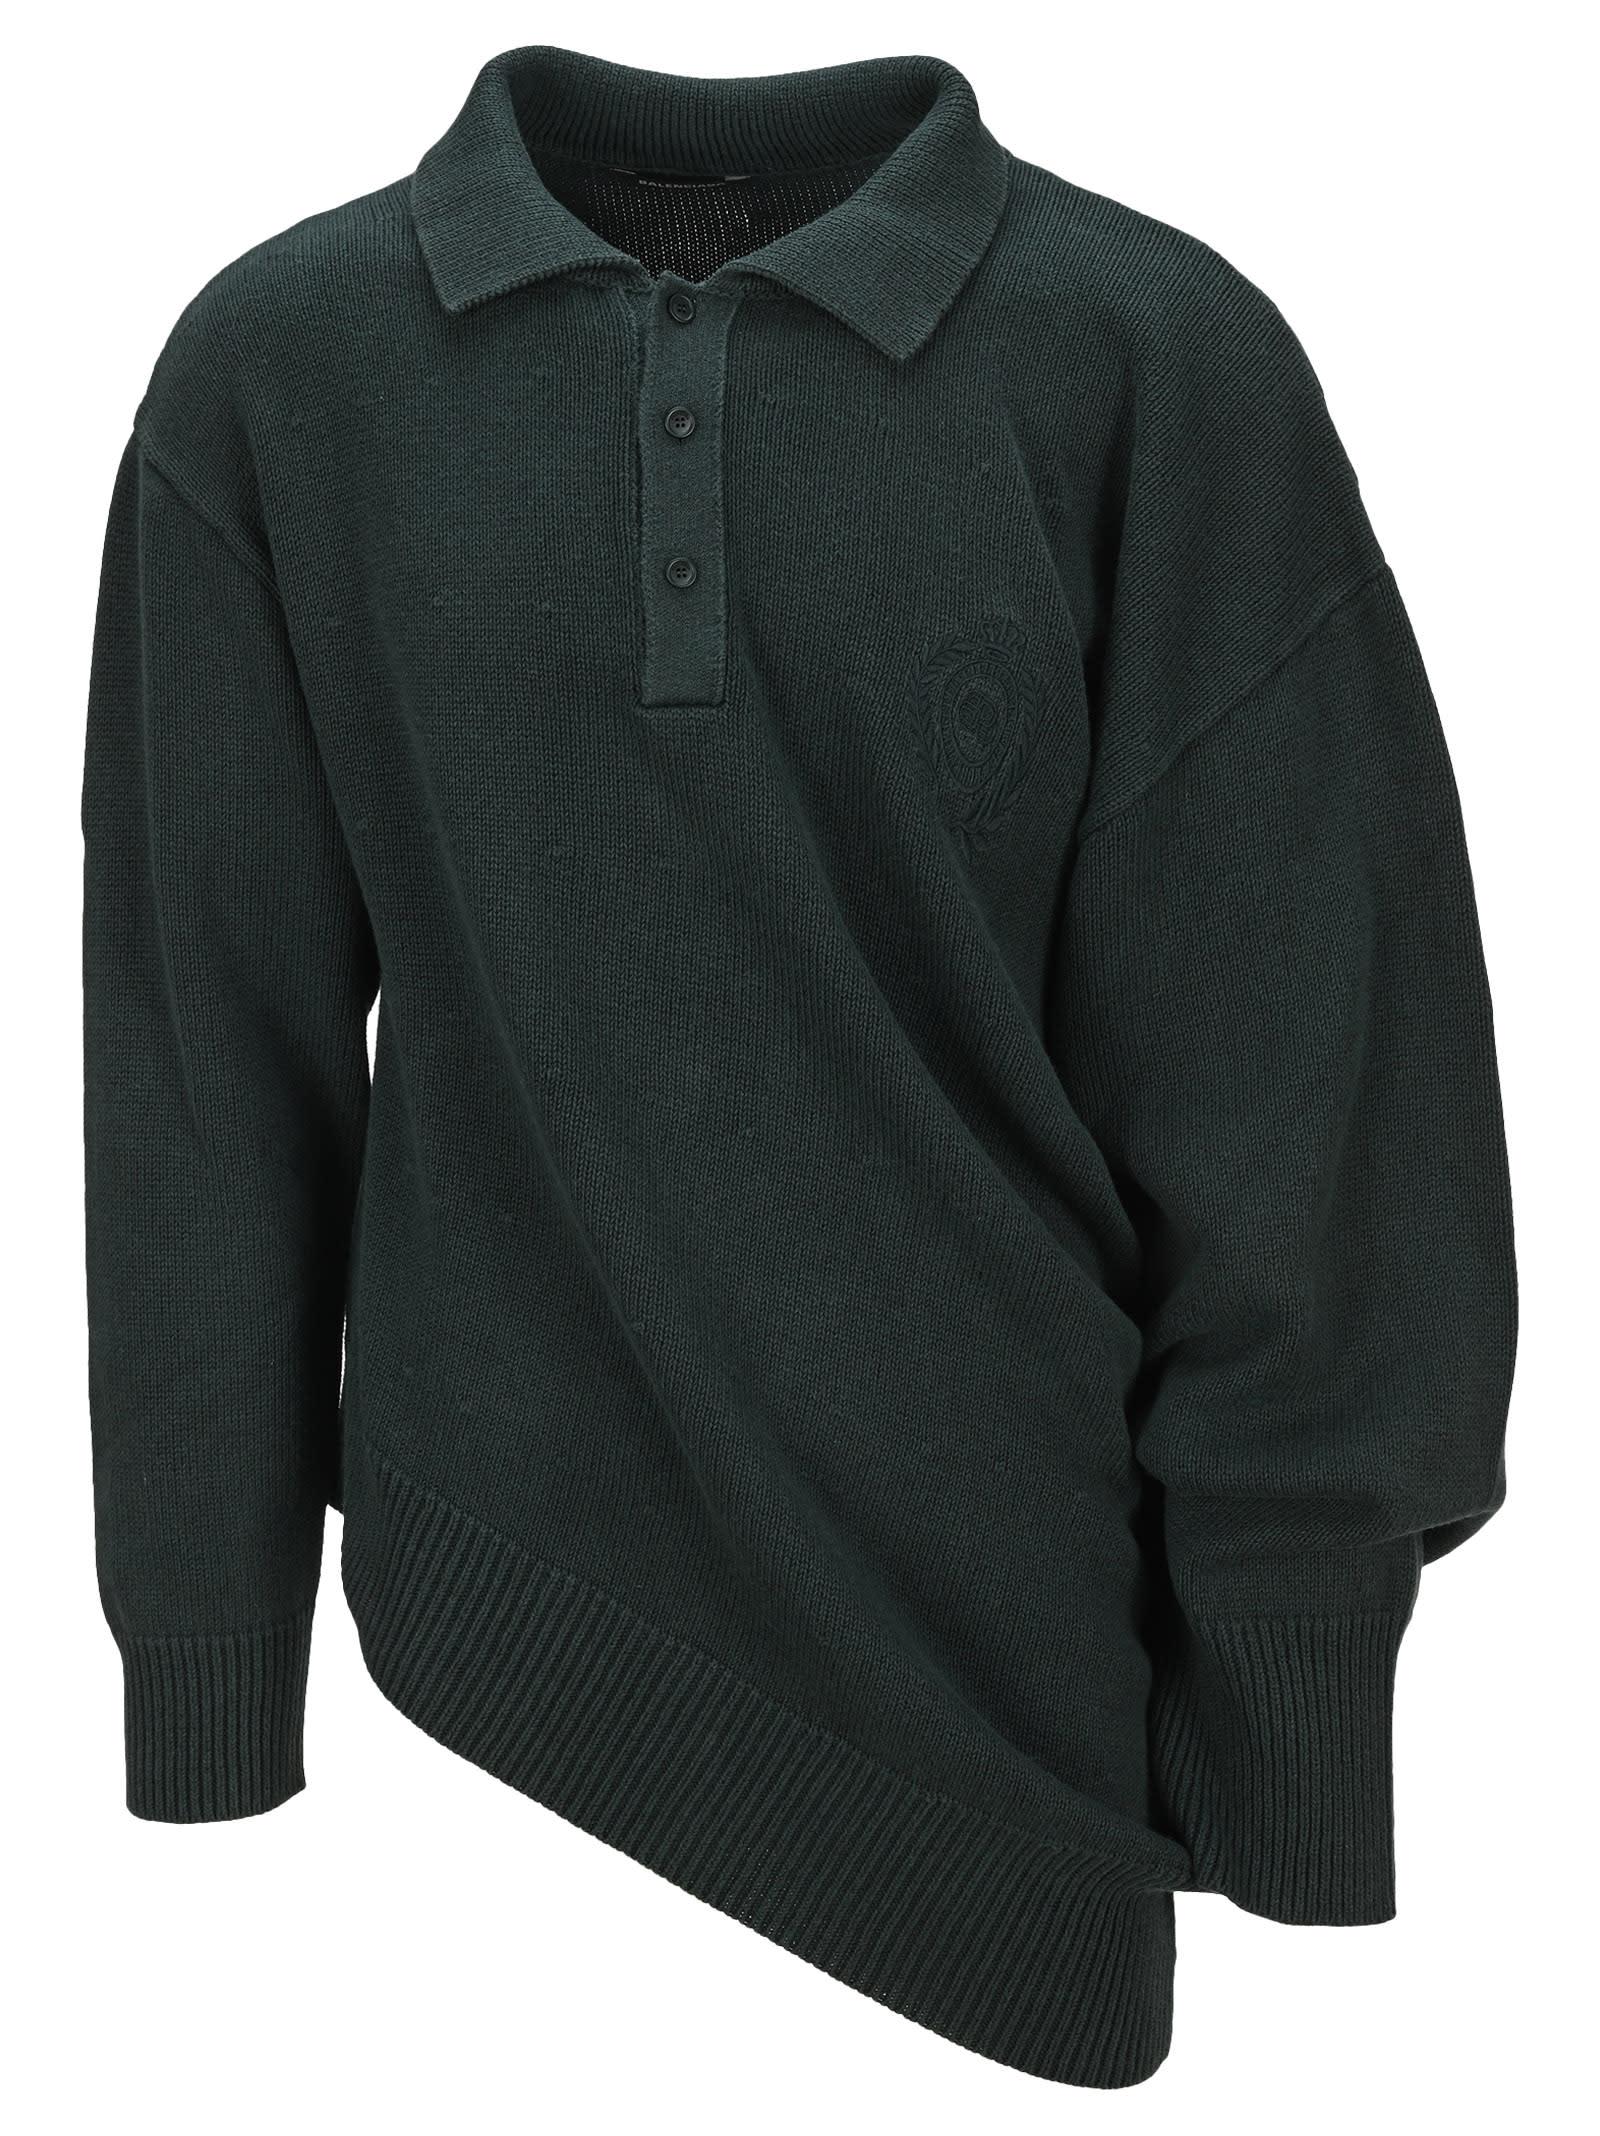 Balenciaga Deformed Rugby Polo Sweater